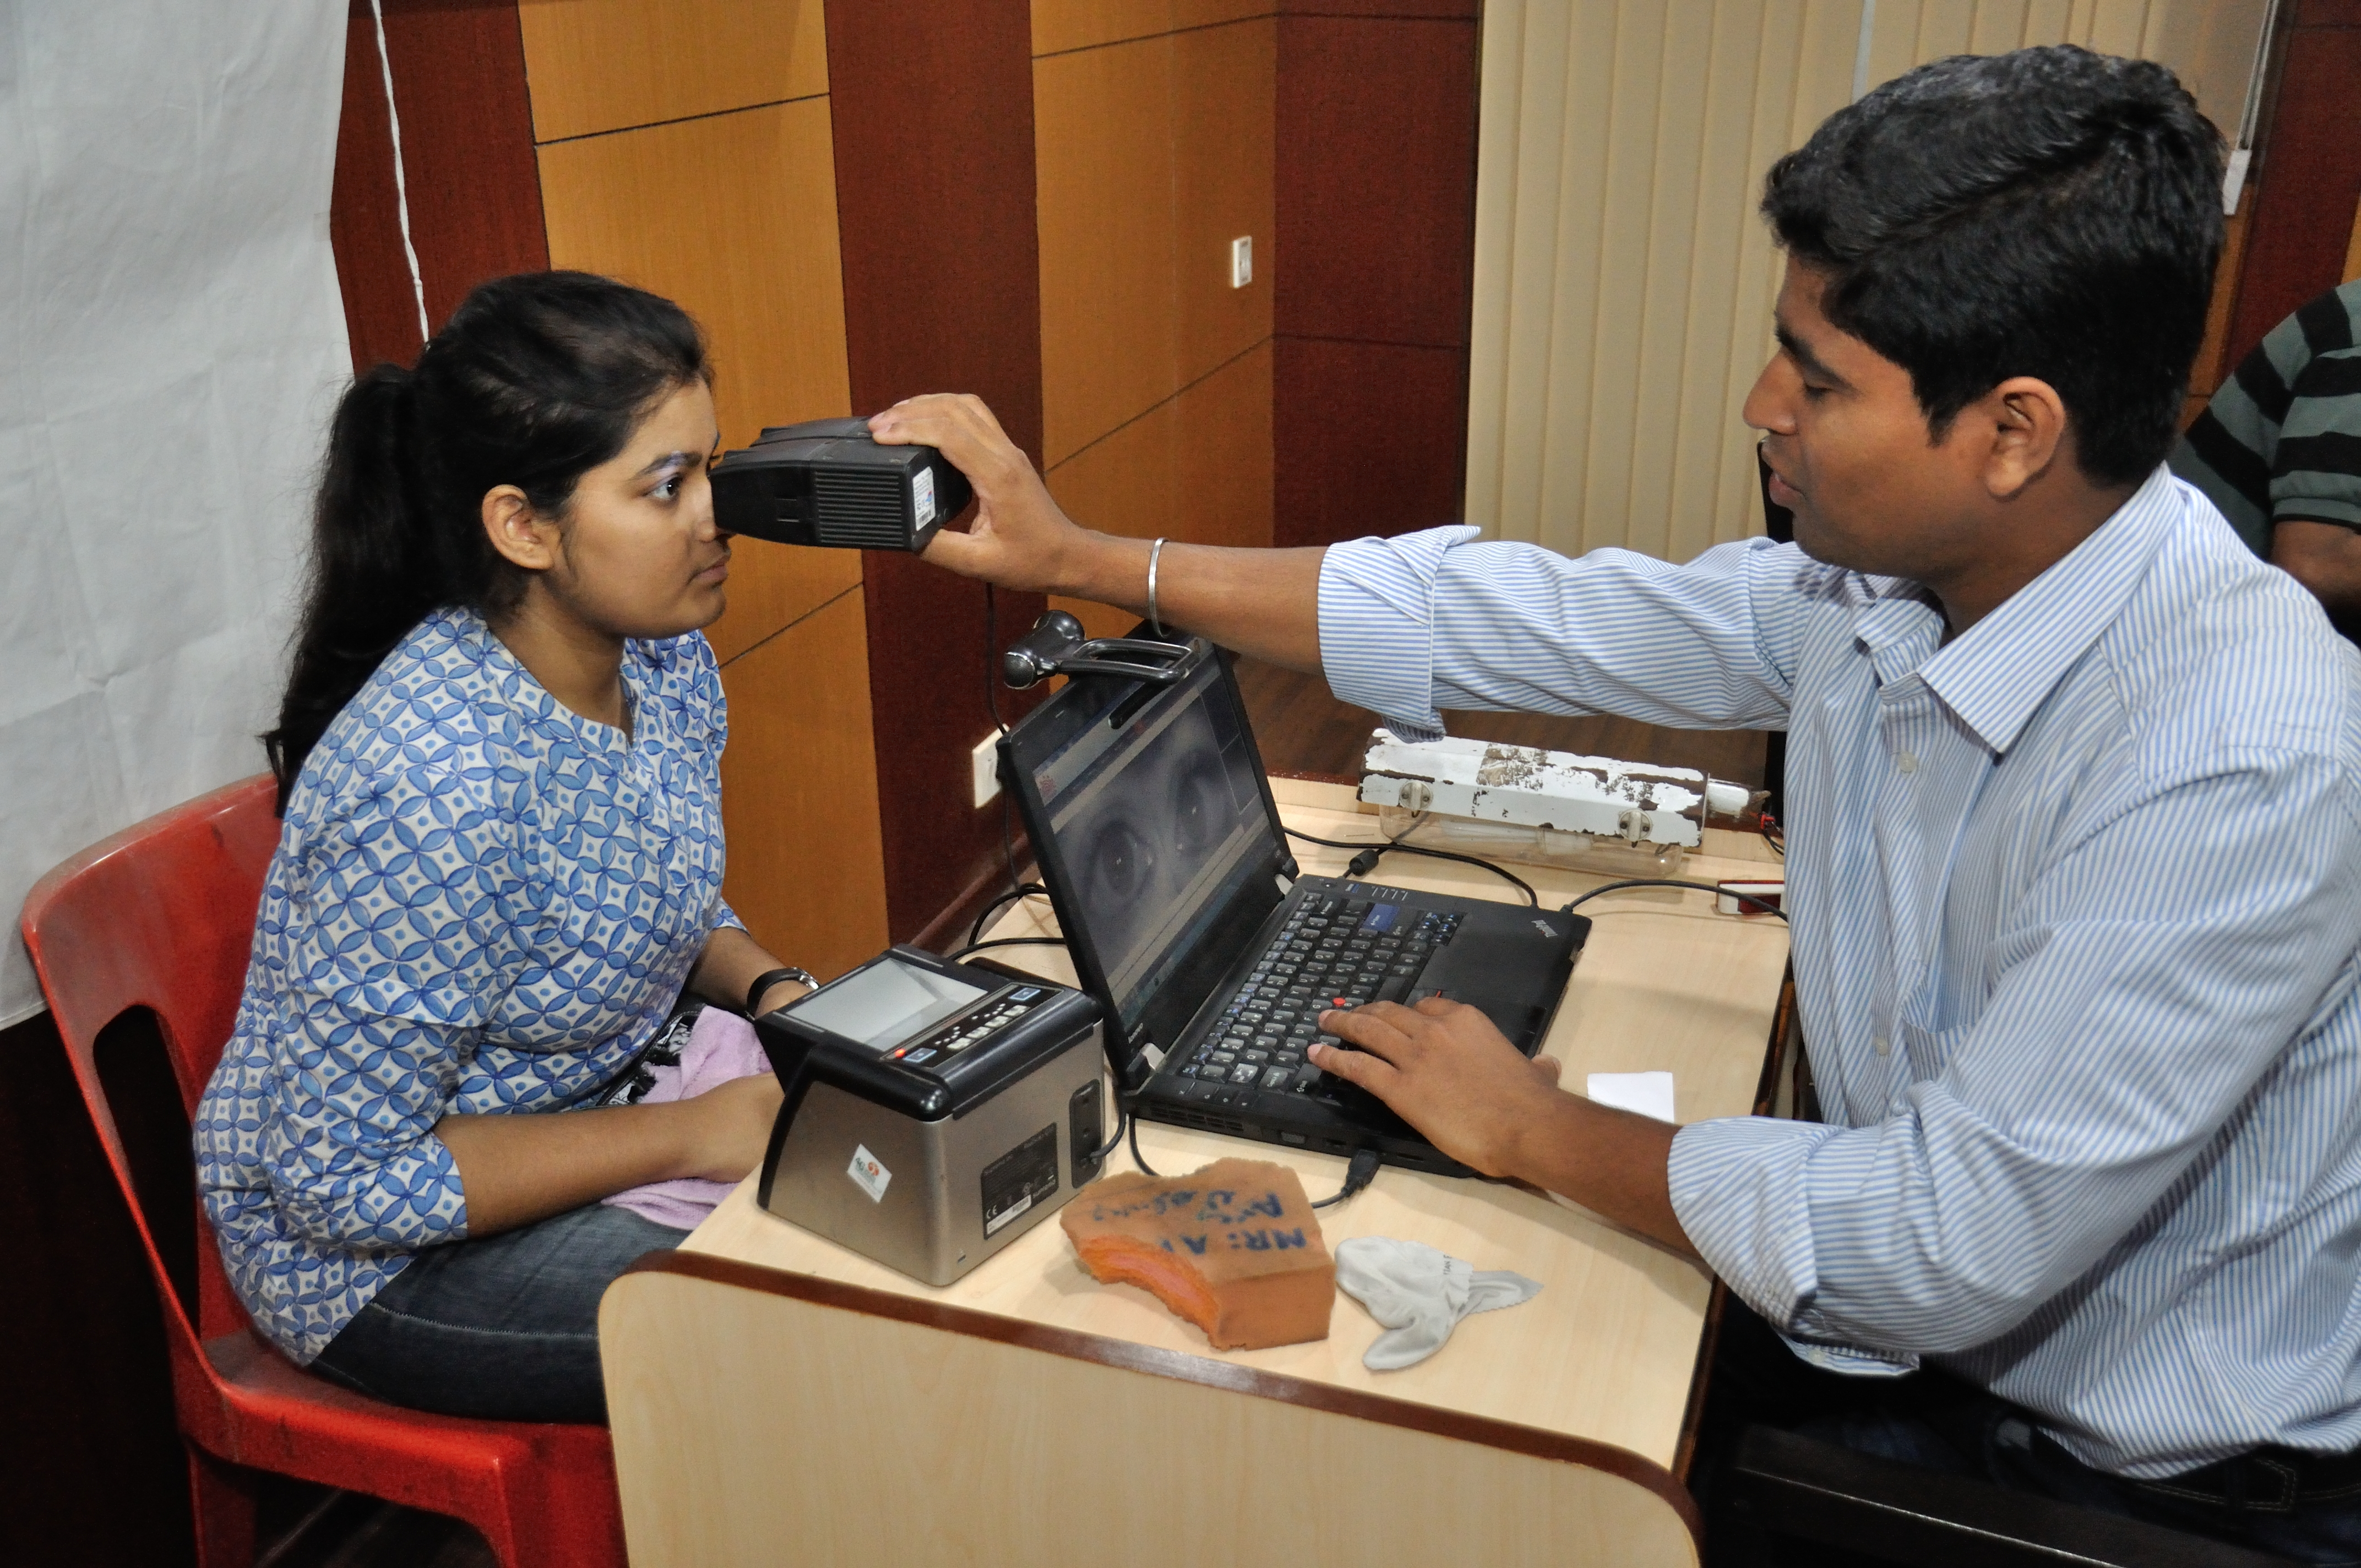 File:Iris Scan - Biometric Data Collection - Aadhaar - Kolkata 2015-03-18 3653.JPG